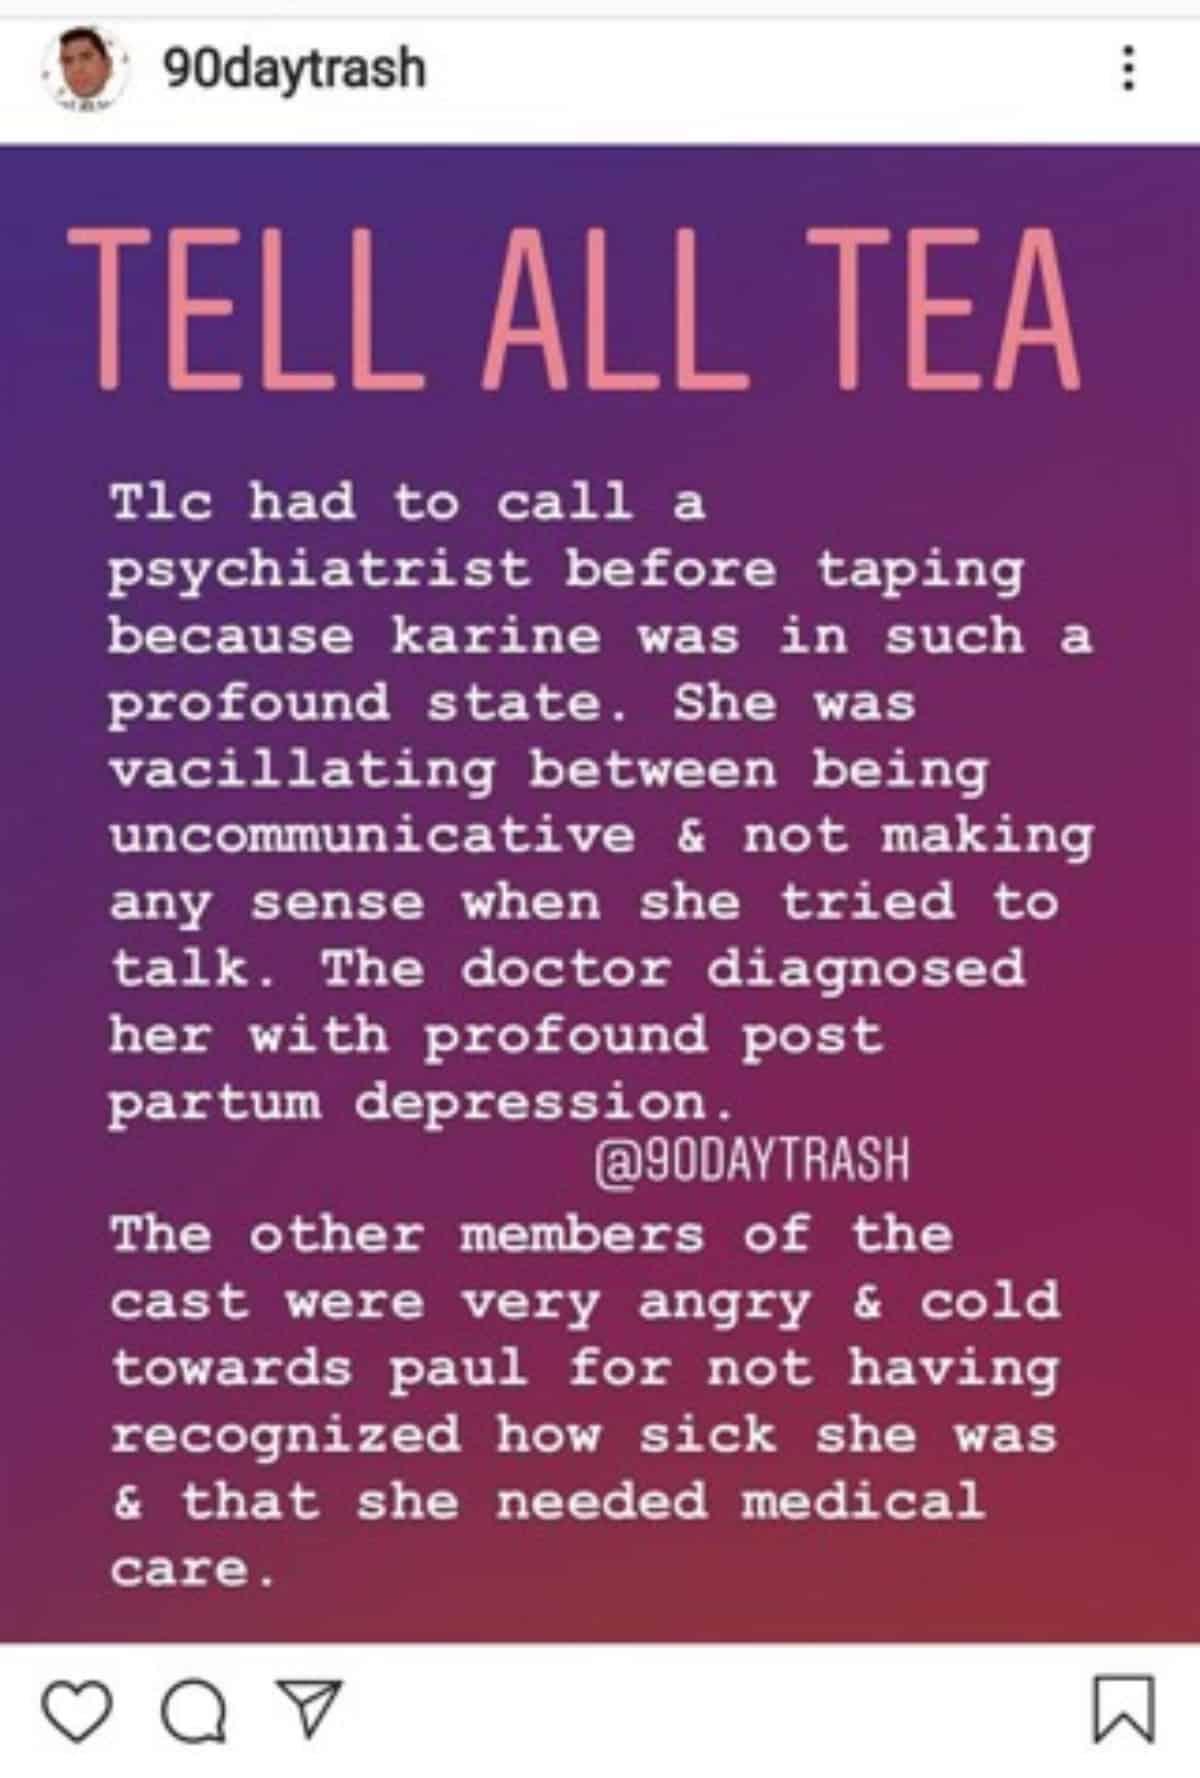 Karine postpartum depression report on Instagram